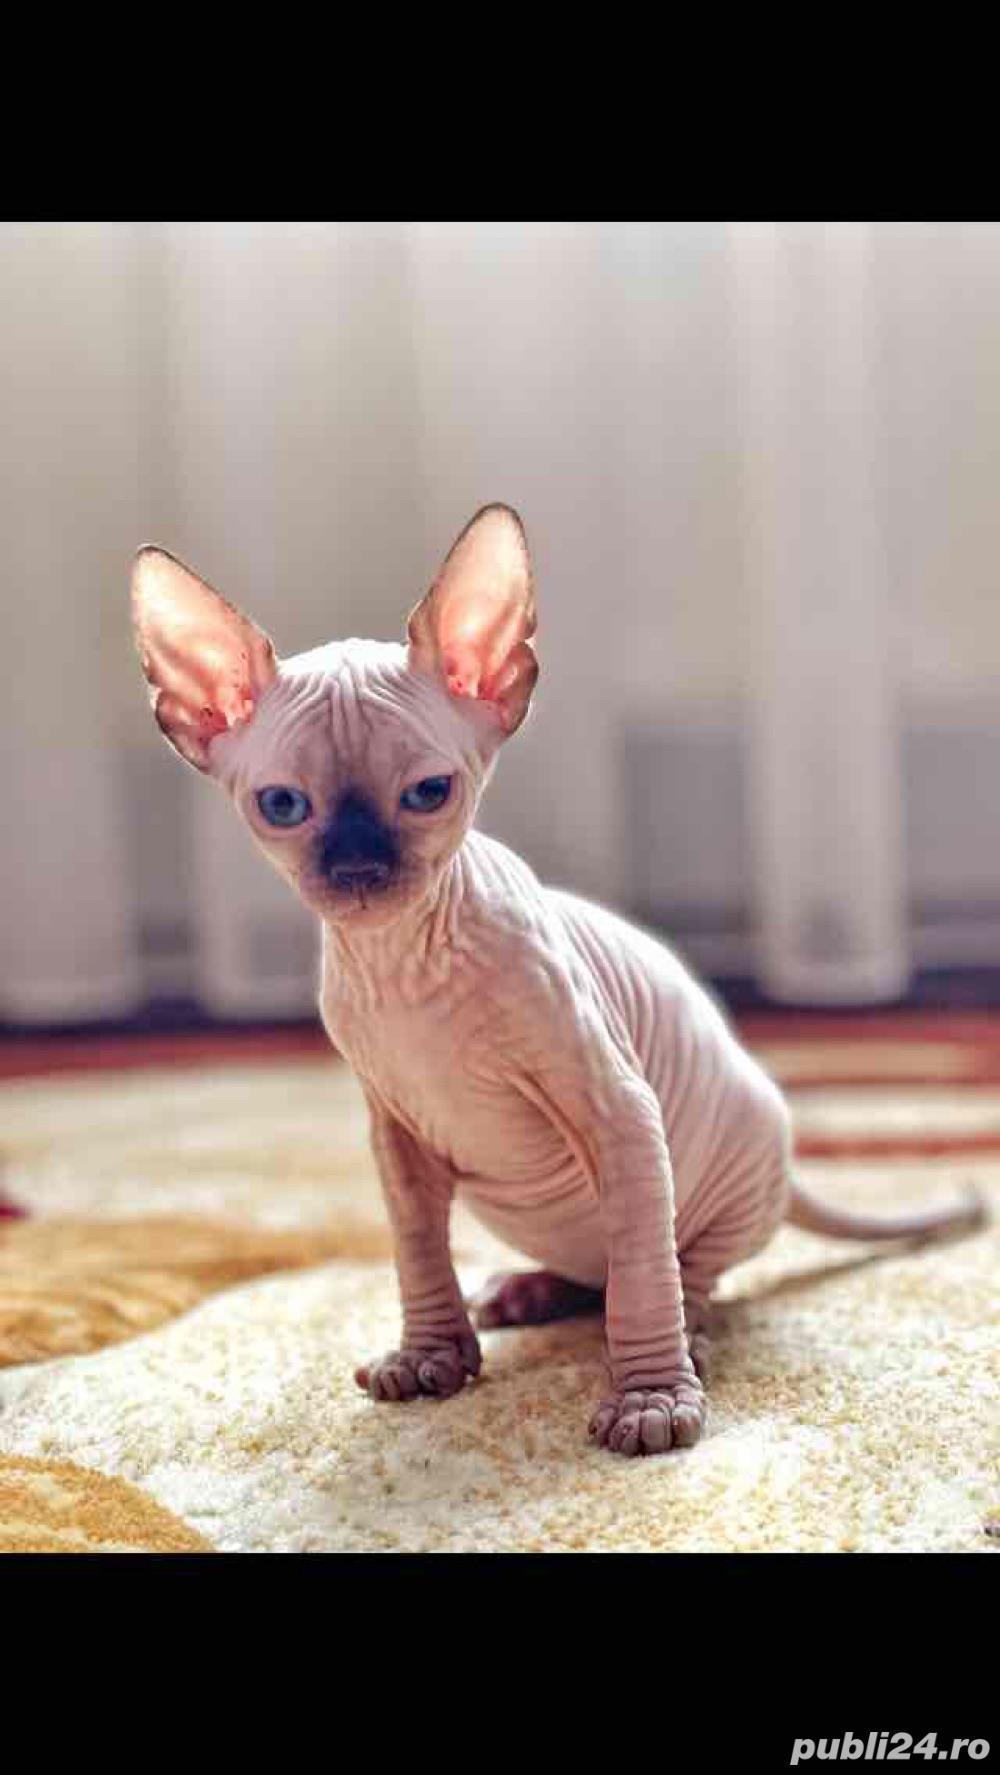 Pisici sfinx   sphynx  fara par, in scop terapeutic